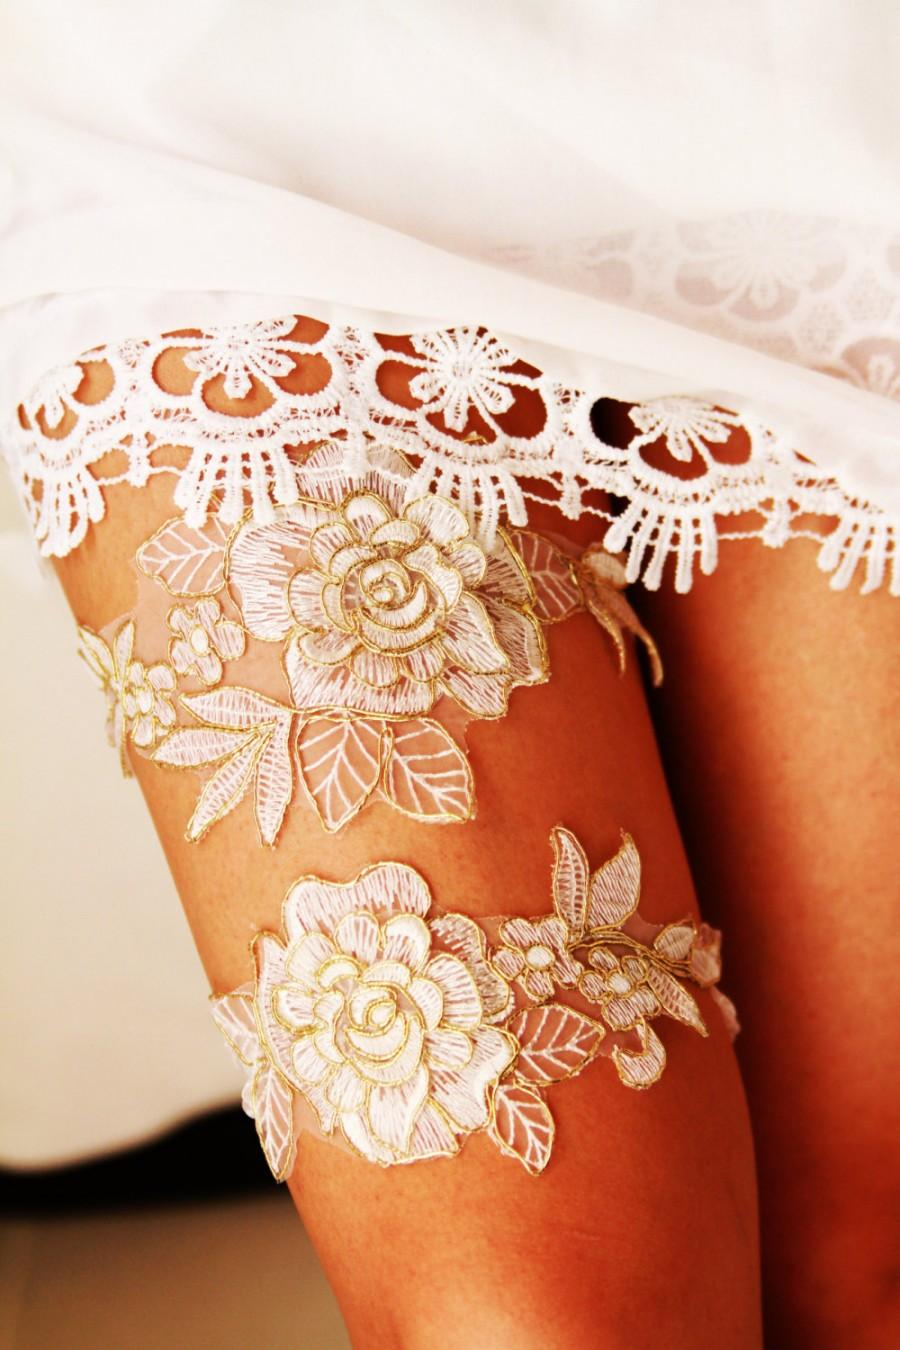 Свадьба - Wedding Garter Set Bridal Garter Set - Rose Gold Ivory Lace  Garters - Keepsake Garter Toss Garter Belt Prom Garter Rustic Boho Wedding